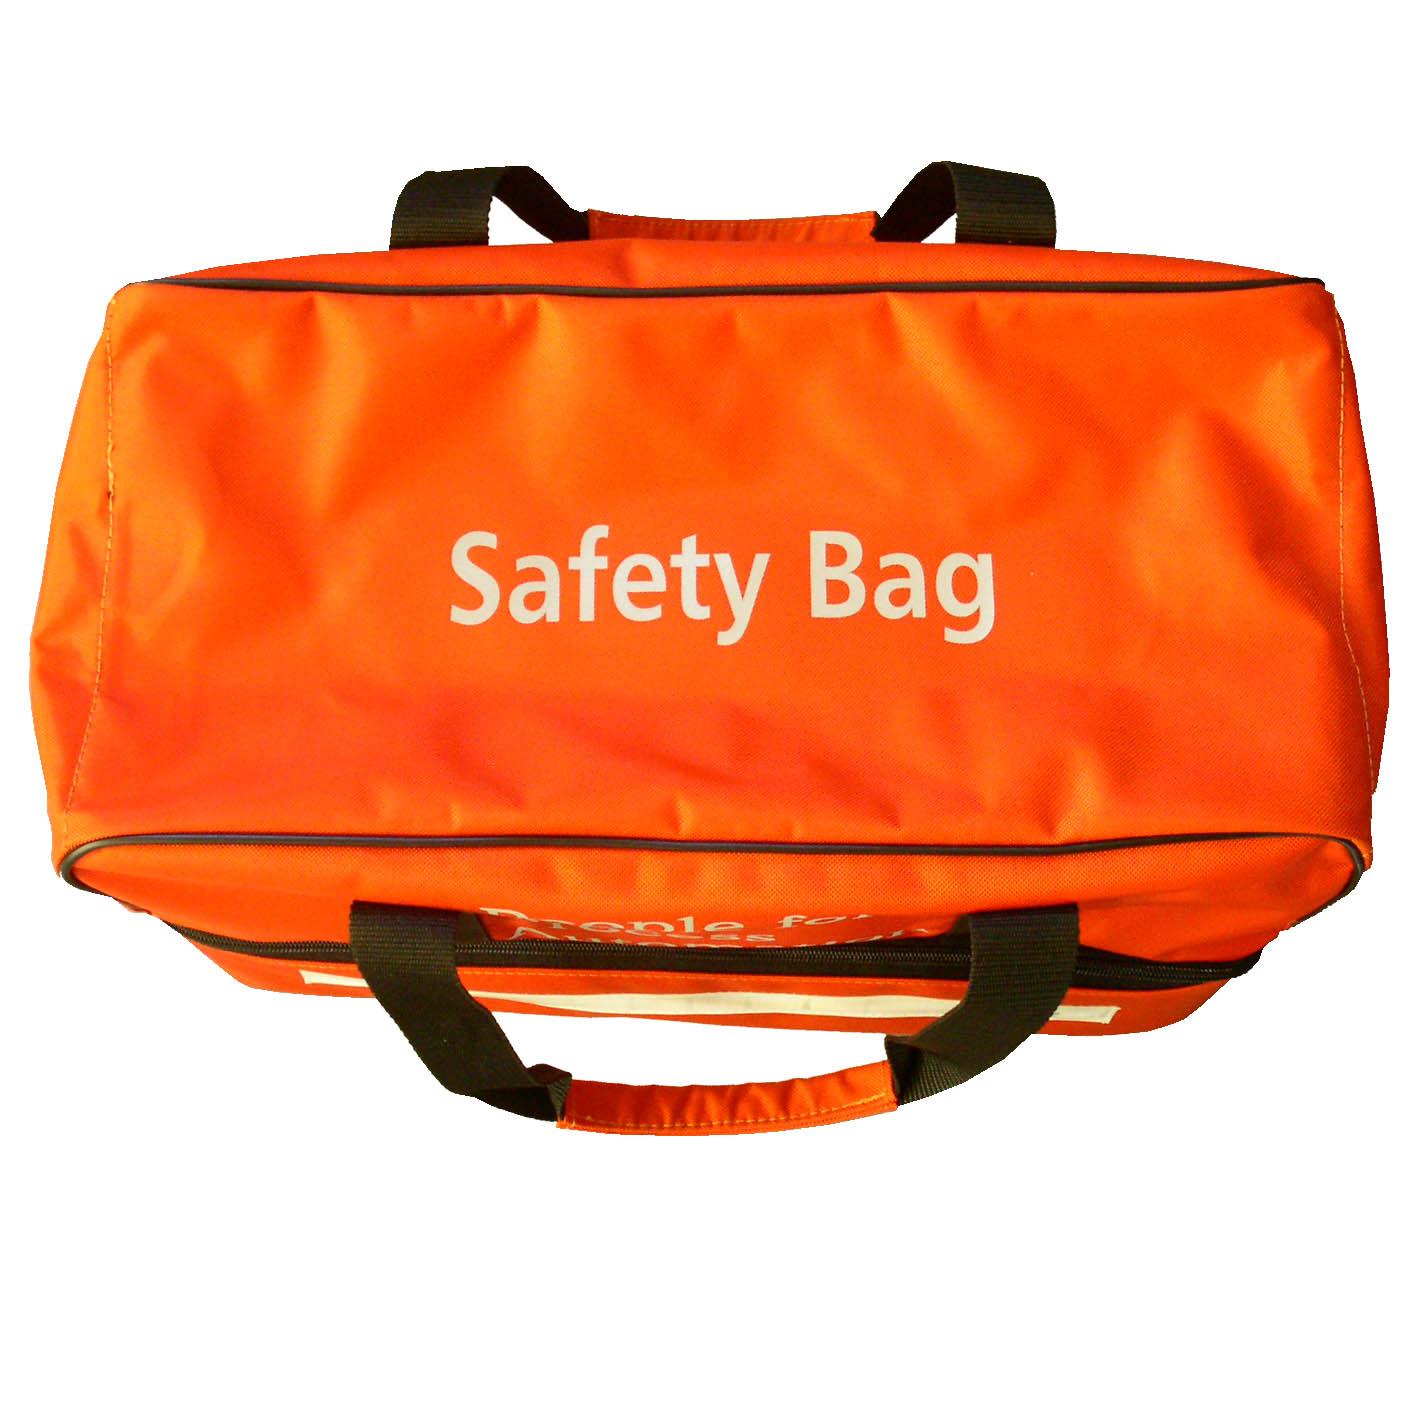 Safety Bag ohne Inhalt / empty Endress + Hauser